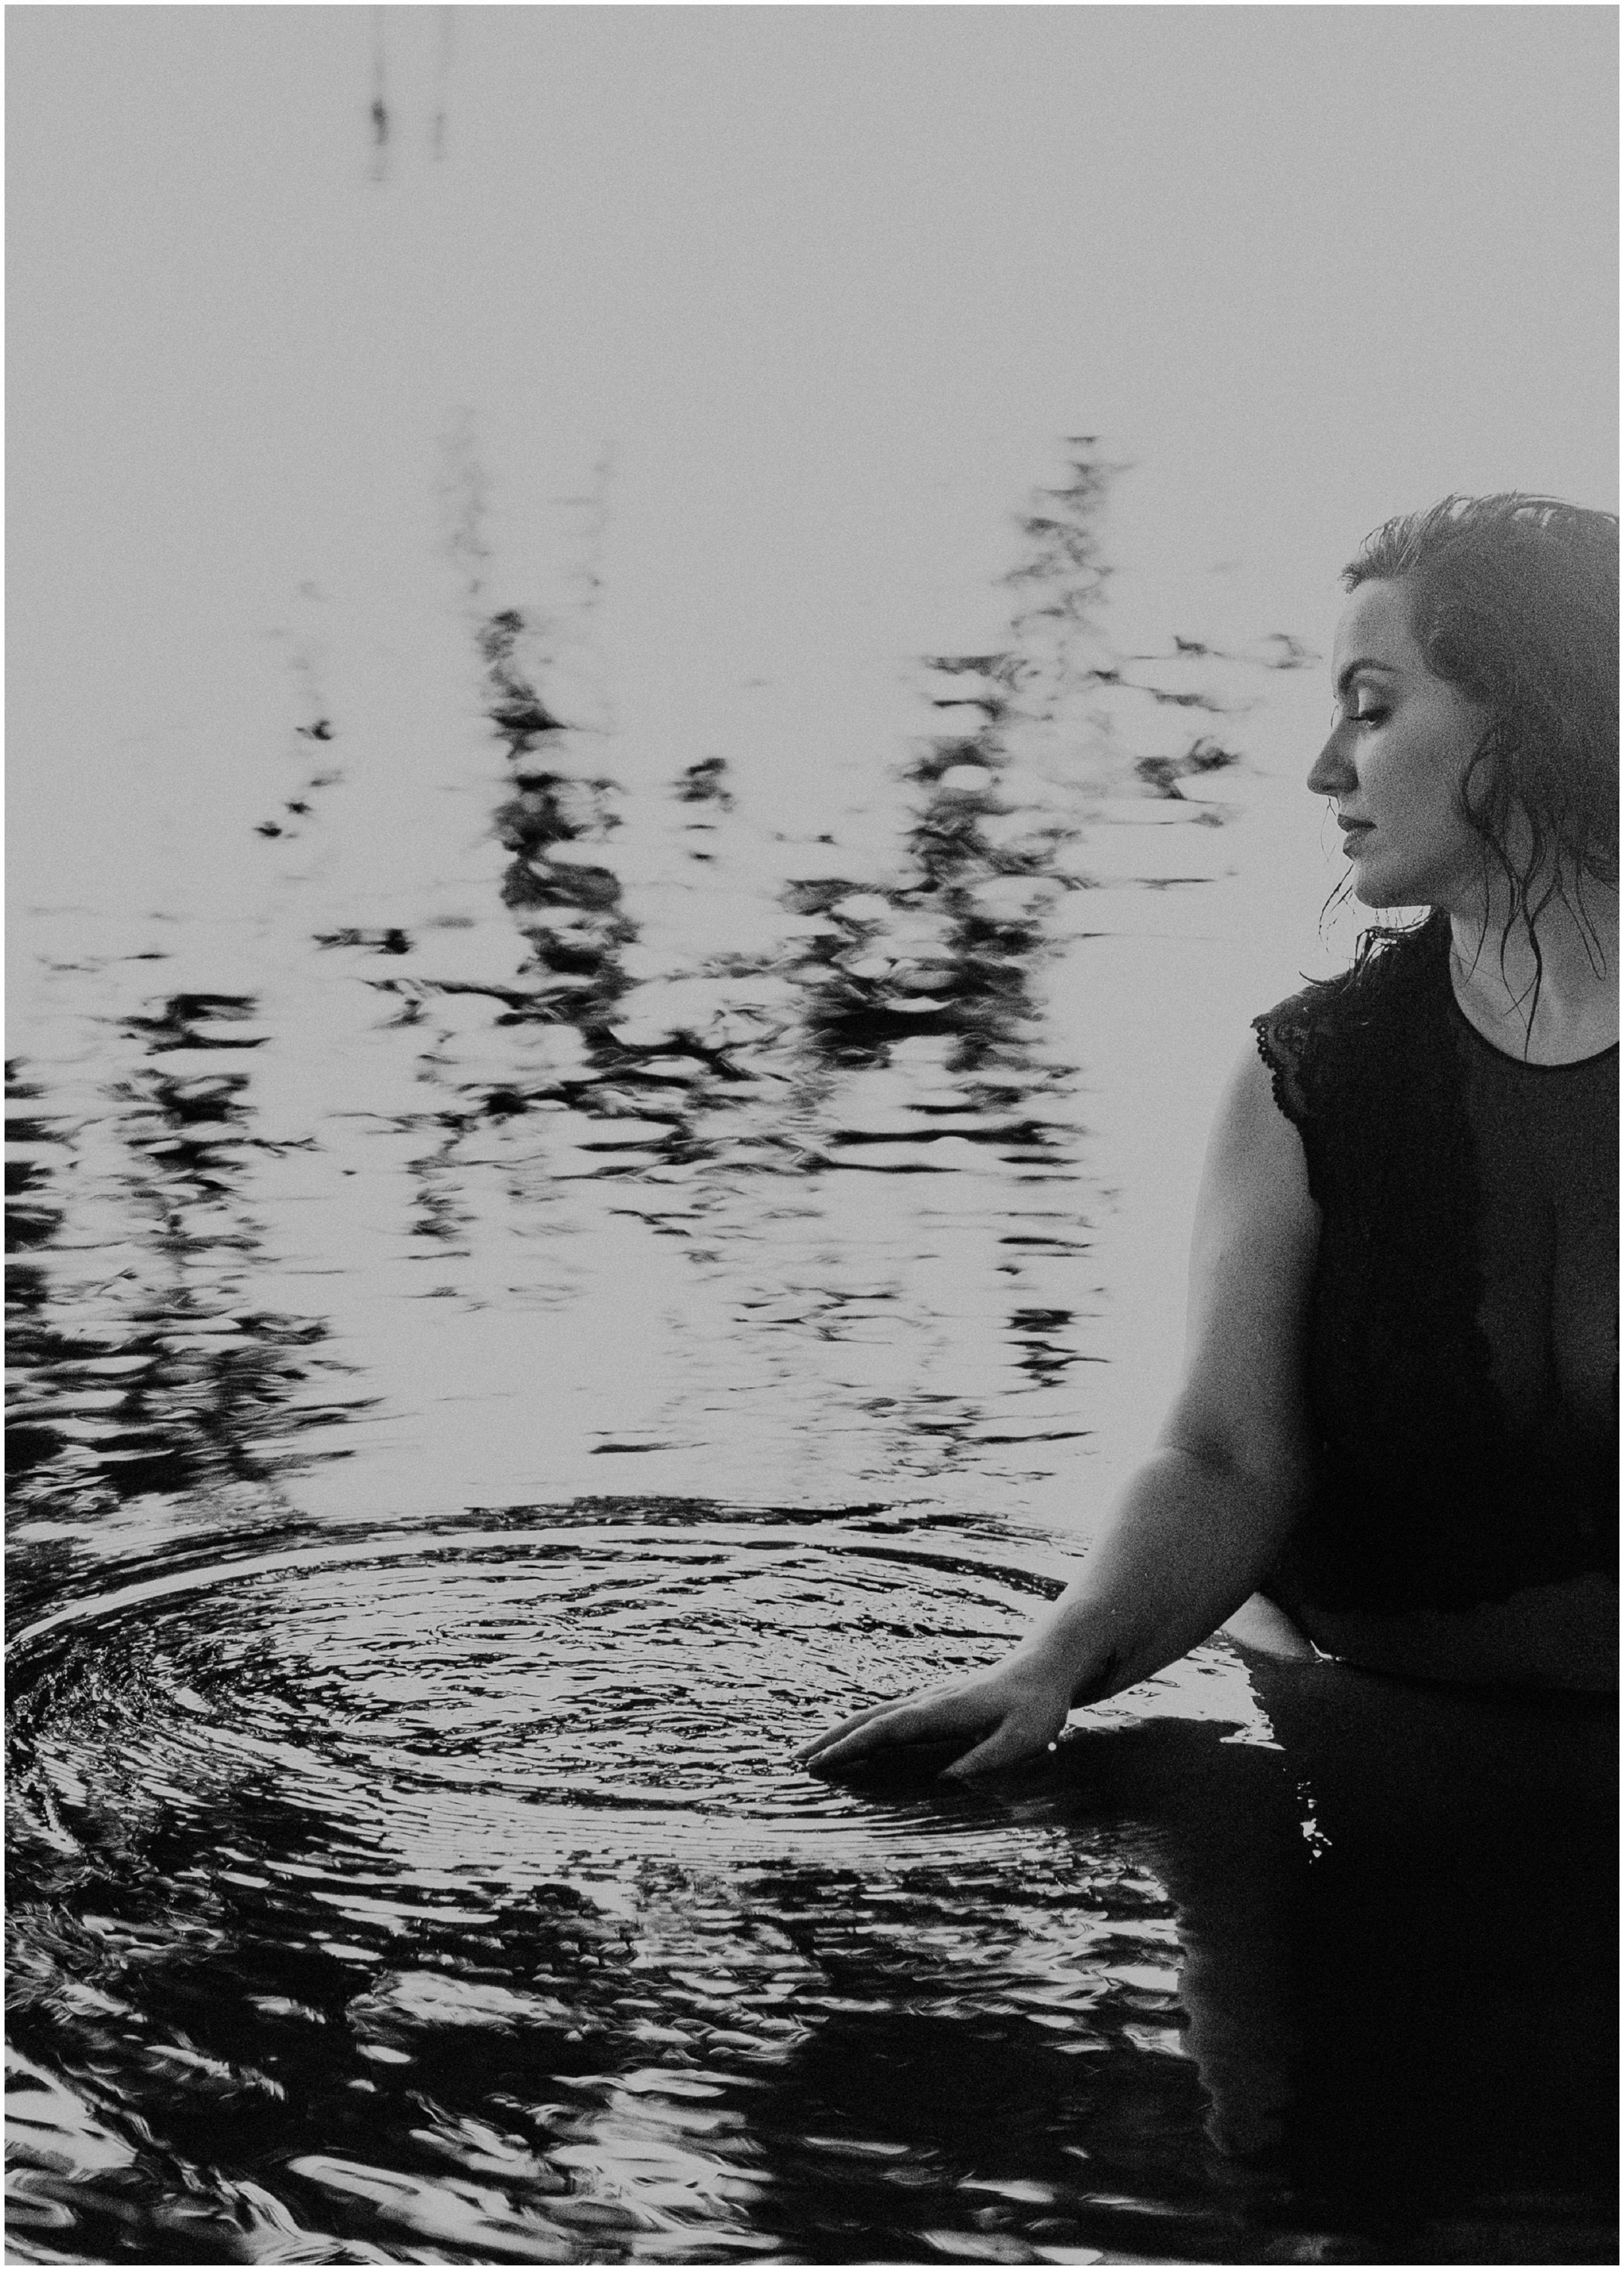 Makayla Madden Photography Boise Idaho Outdoor Boudoir Photographer Boudoir Inspiration Oregon Boudoir Photographer Hipster Boise Hair Makeup Artist Water Lake Boudoir Inspiration Reflections